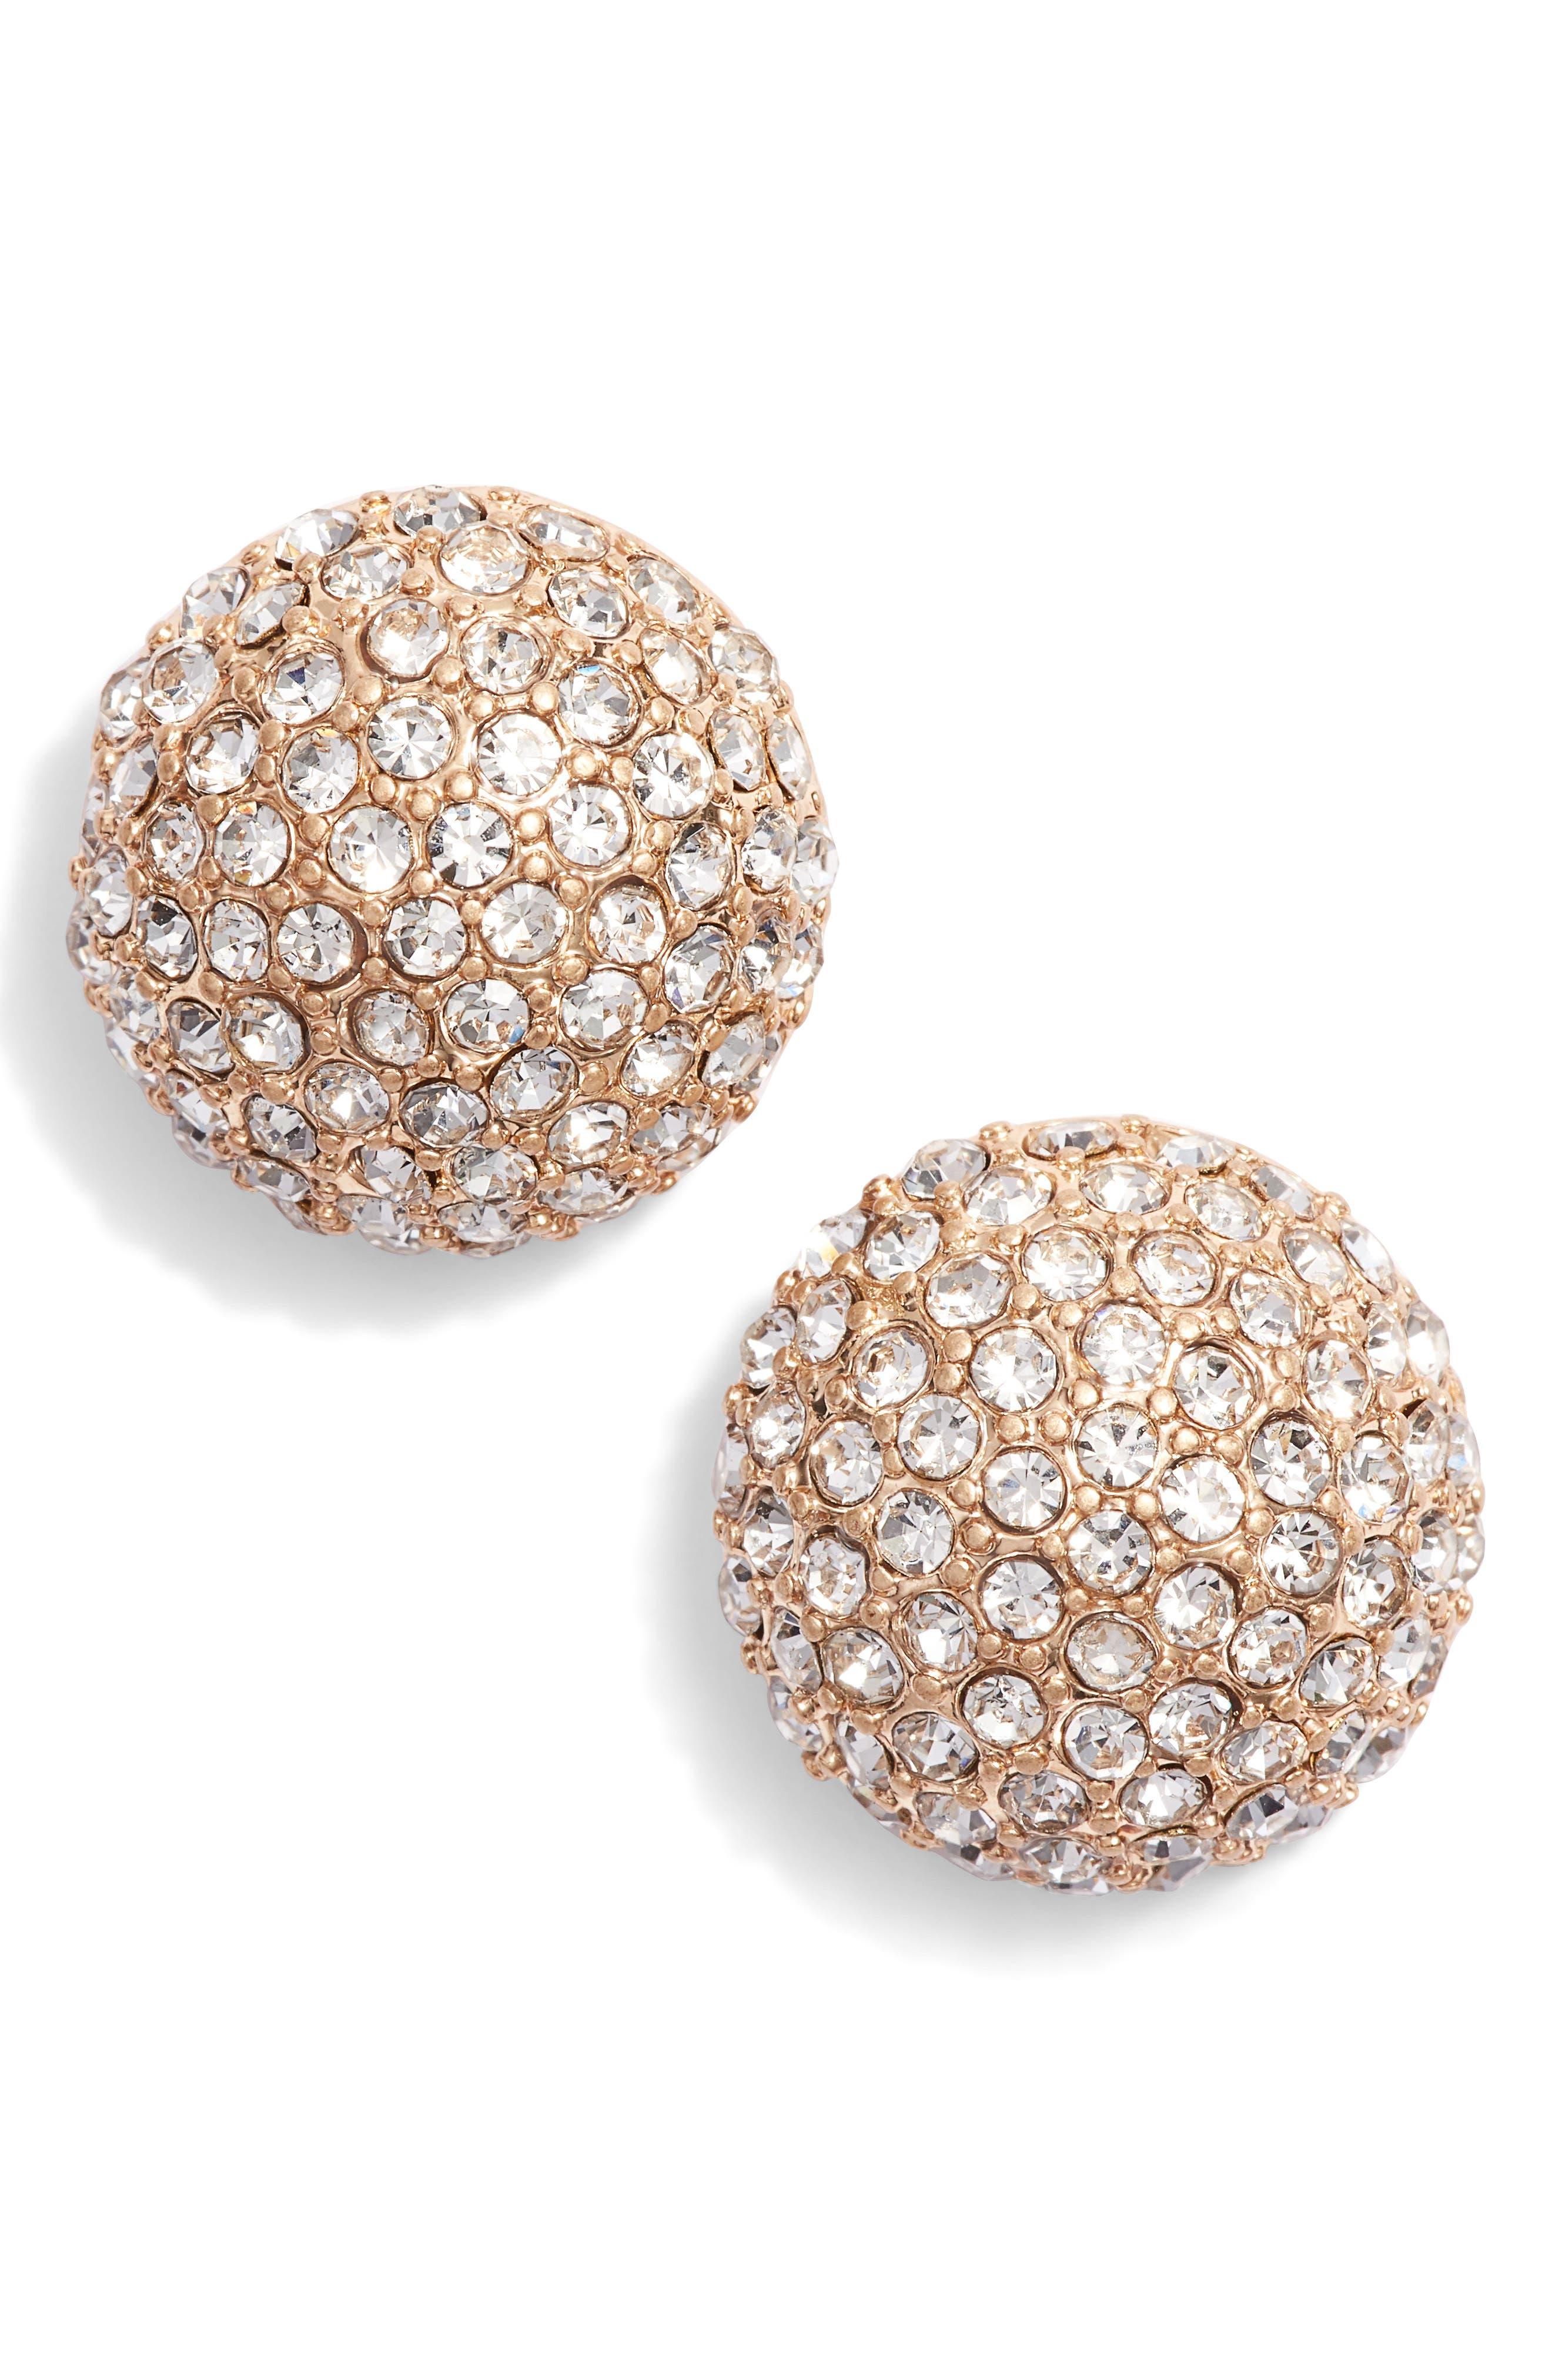 Pavé Stud Earrings,                         Main,                         color, CLEAR- GOLD